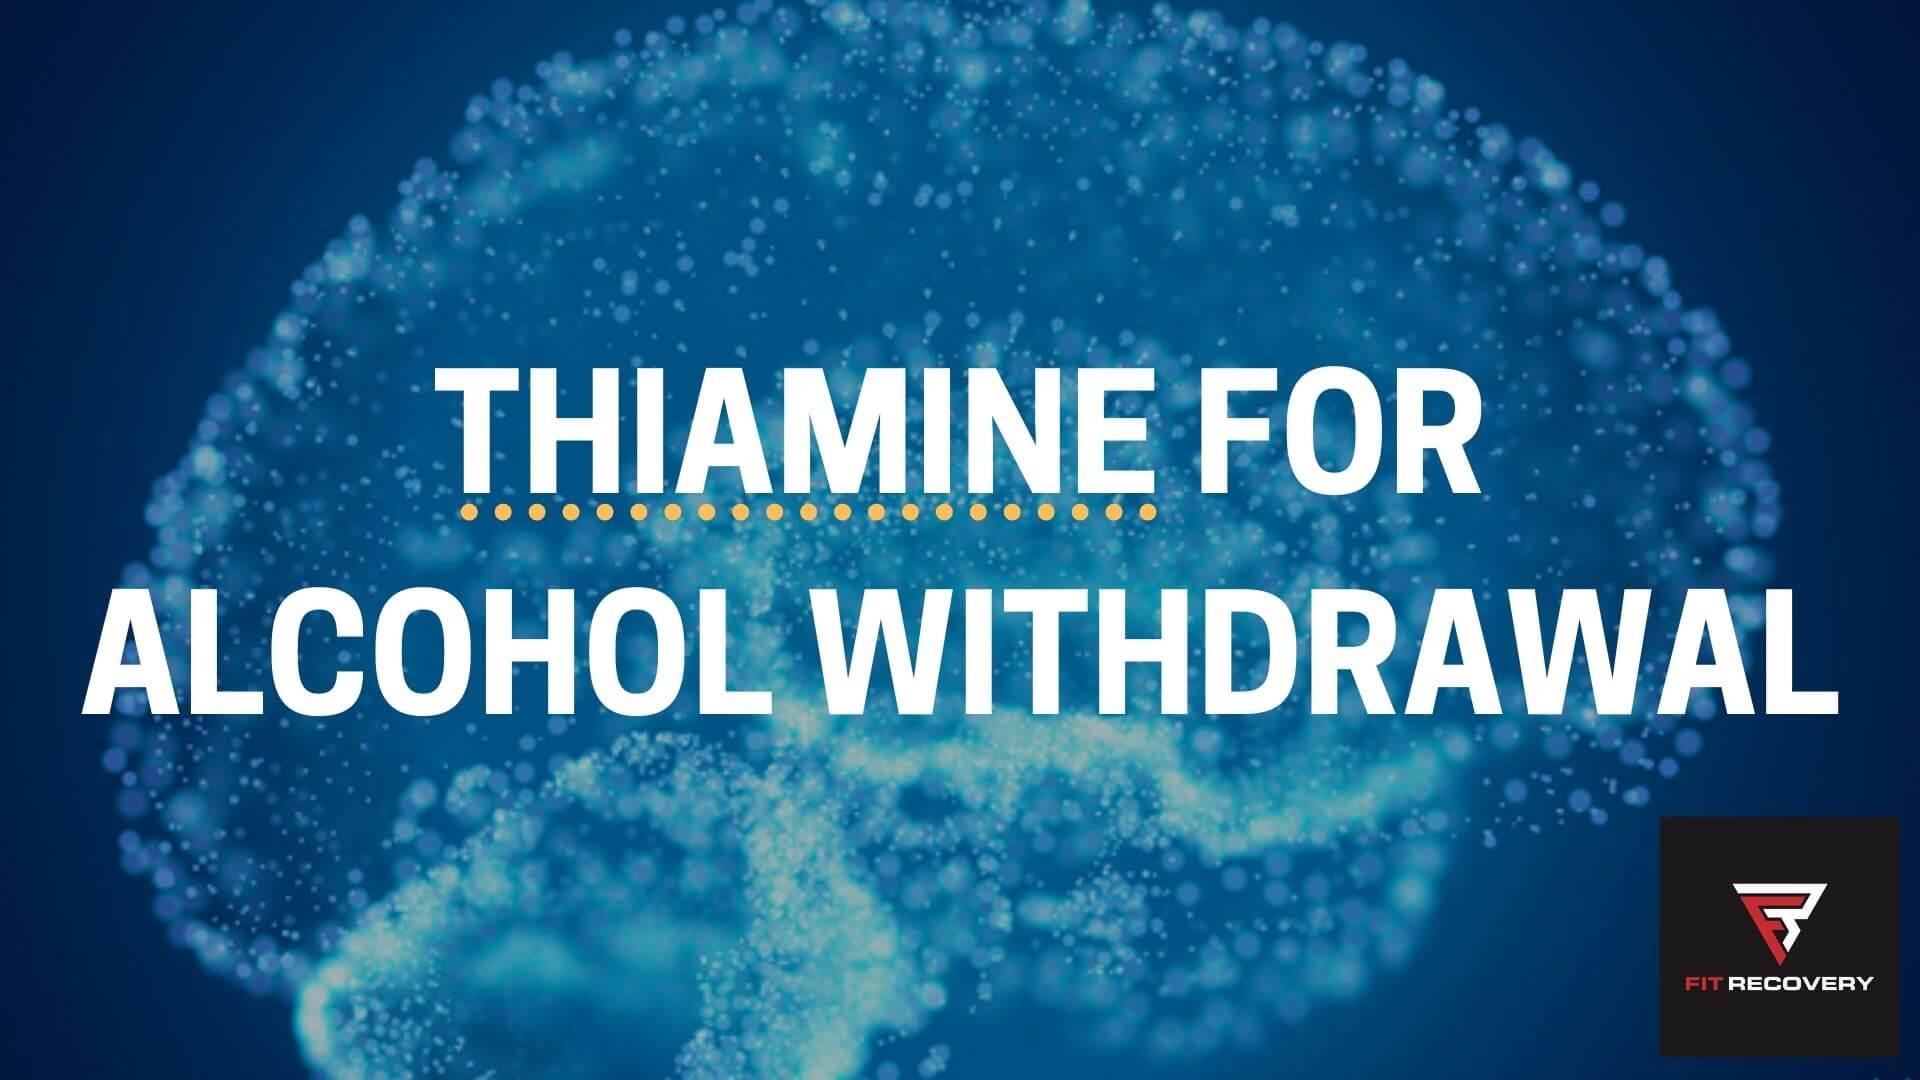 thiamine dosage for alcoholics